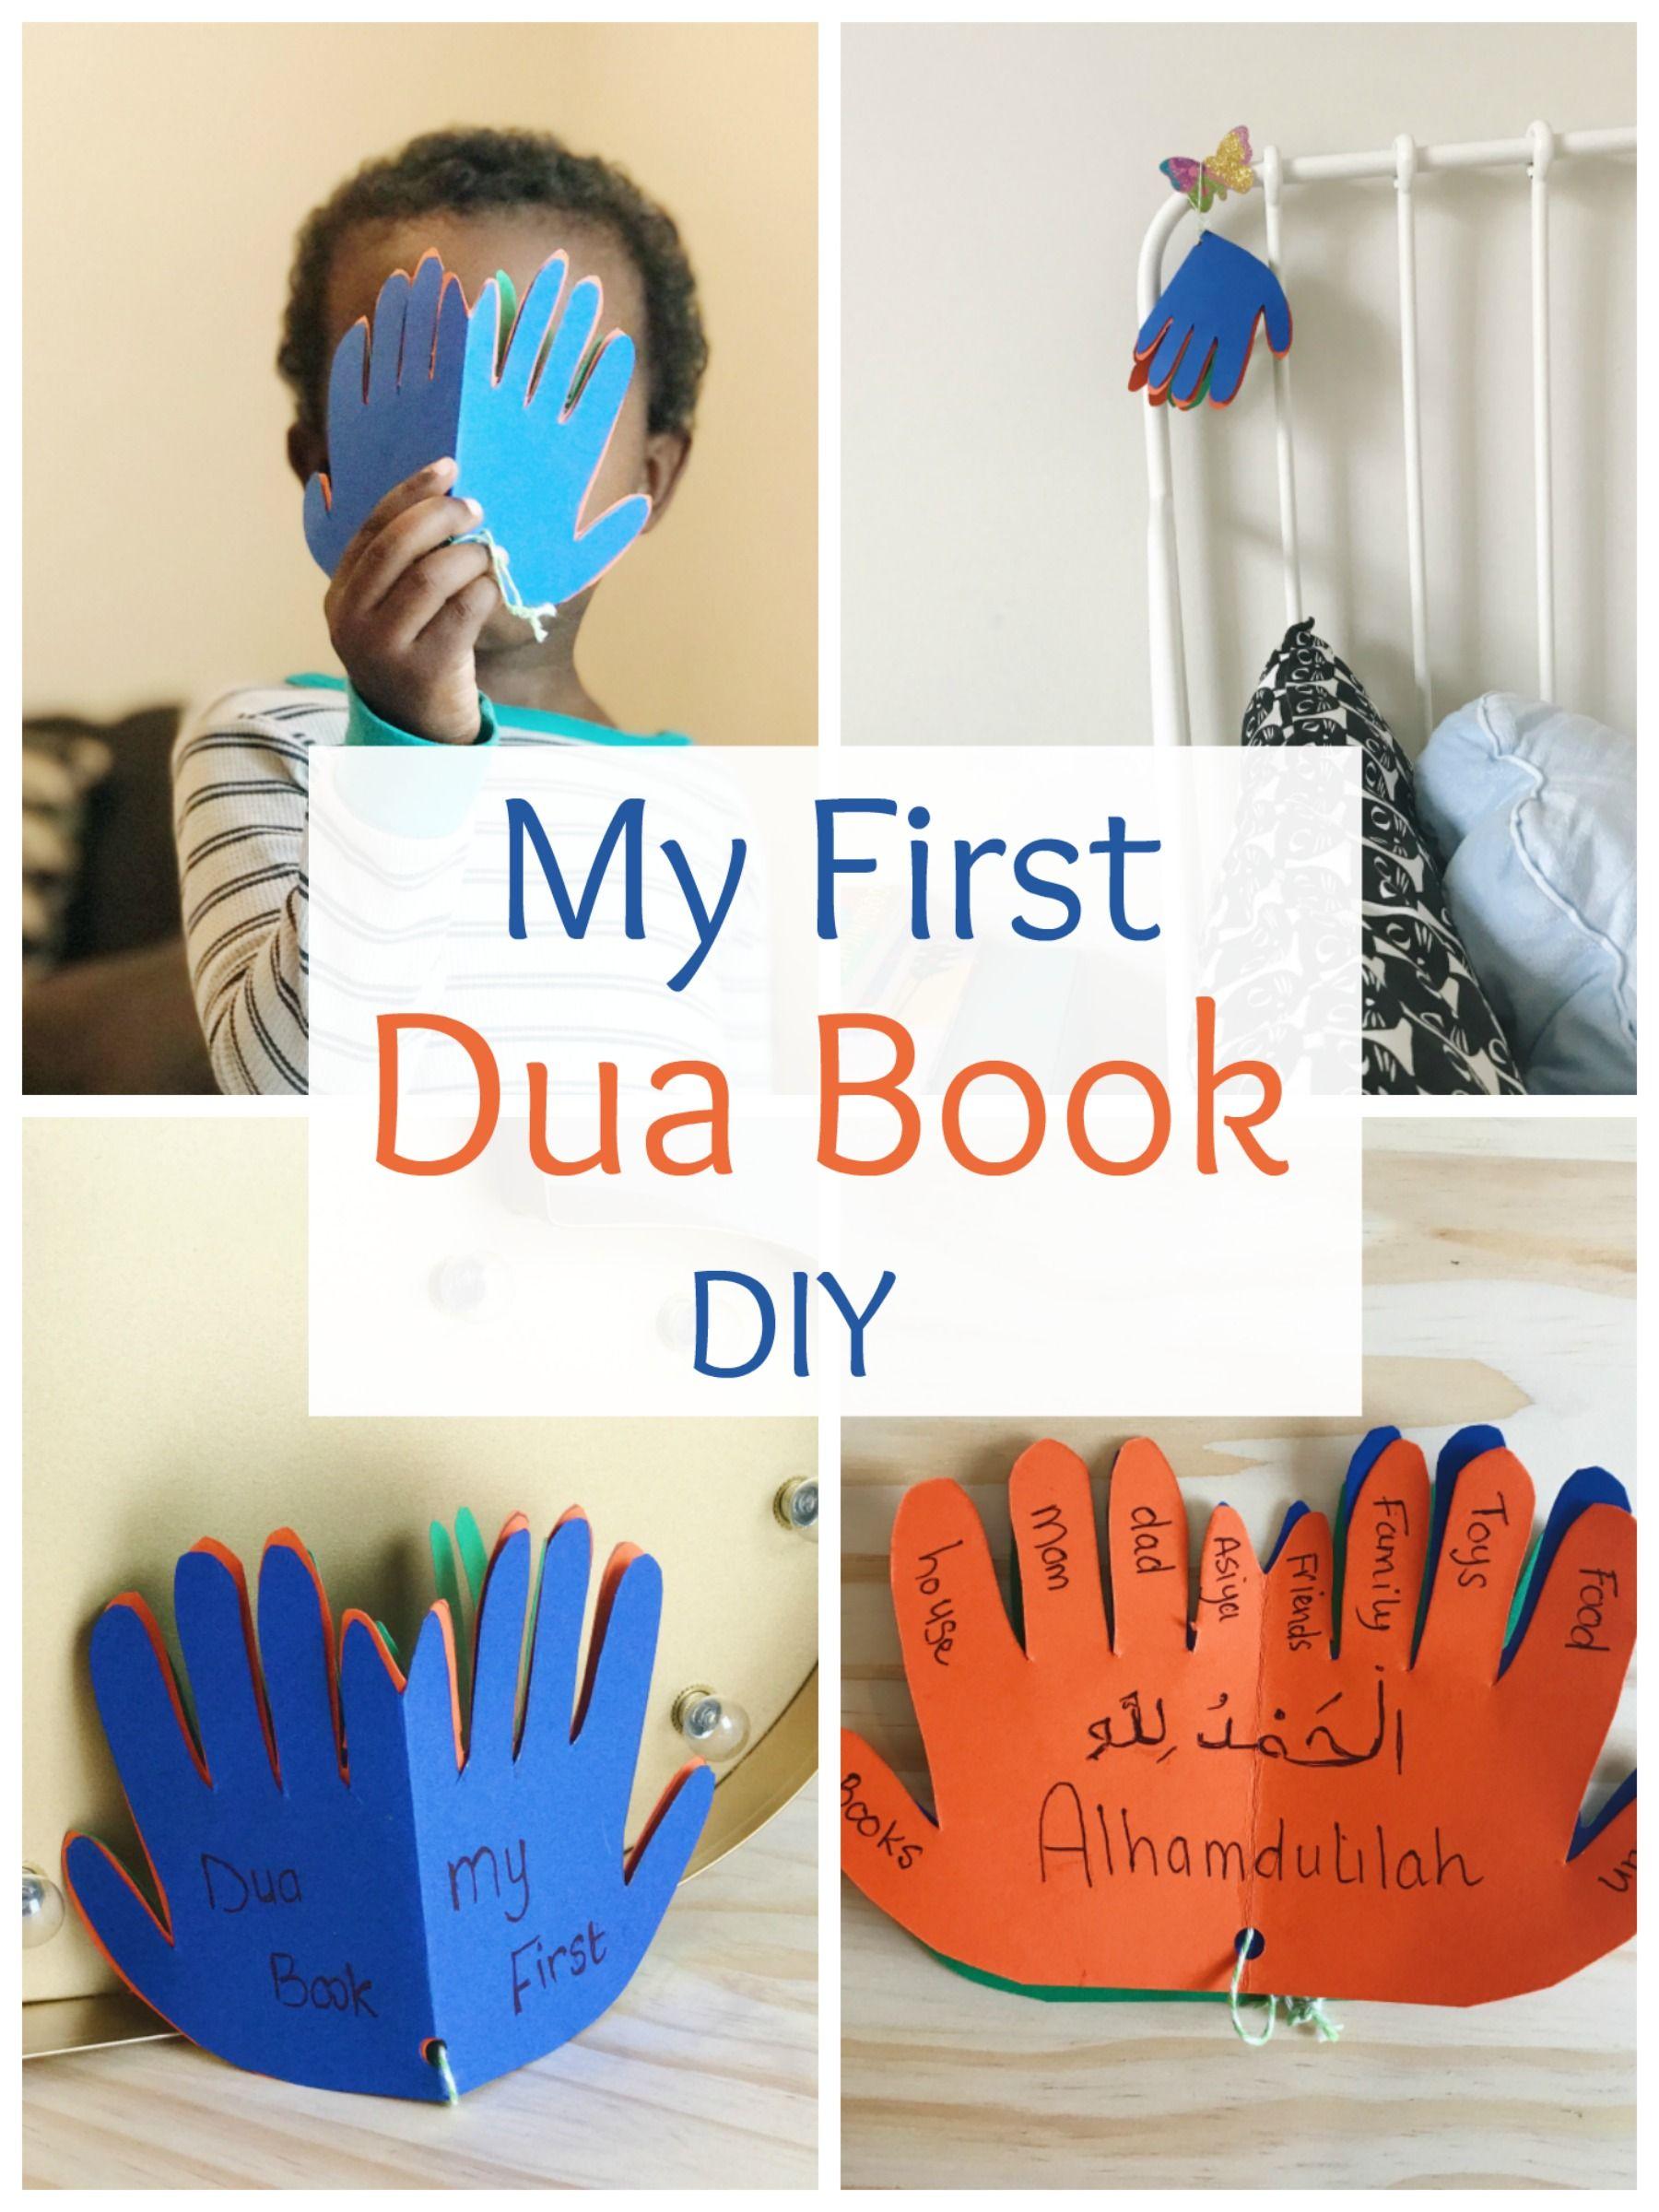 My First Dua Book Diy